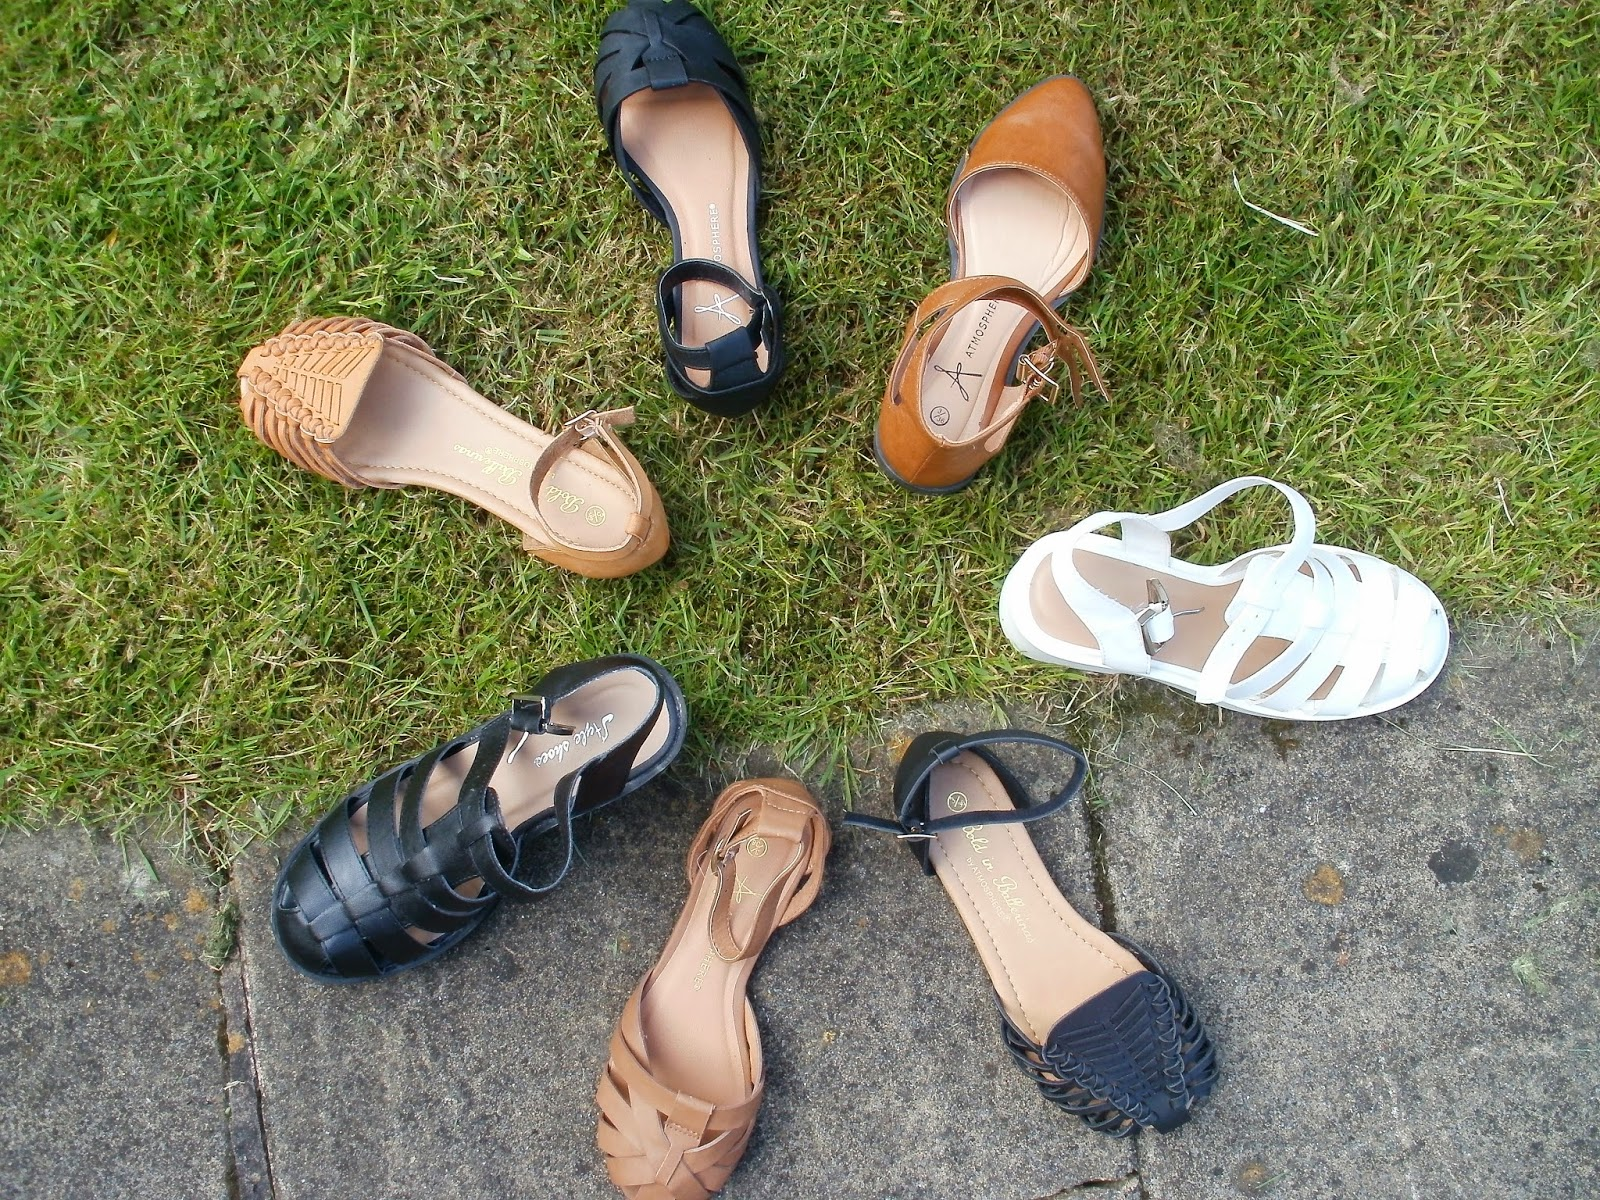 c60408da7eb Porcelain Eleanor: Shoes on a Shoestring #5 Sandals for Toe-a-phobes